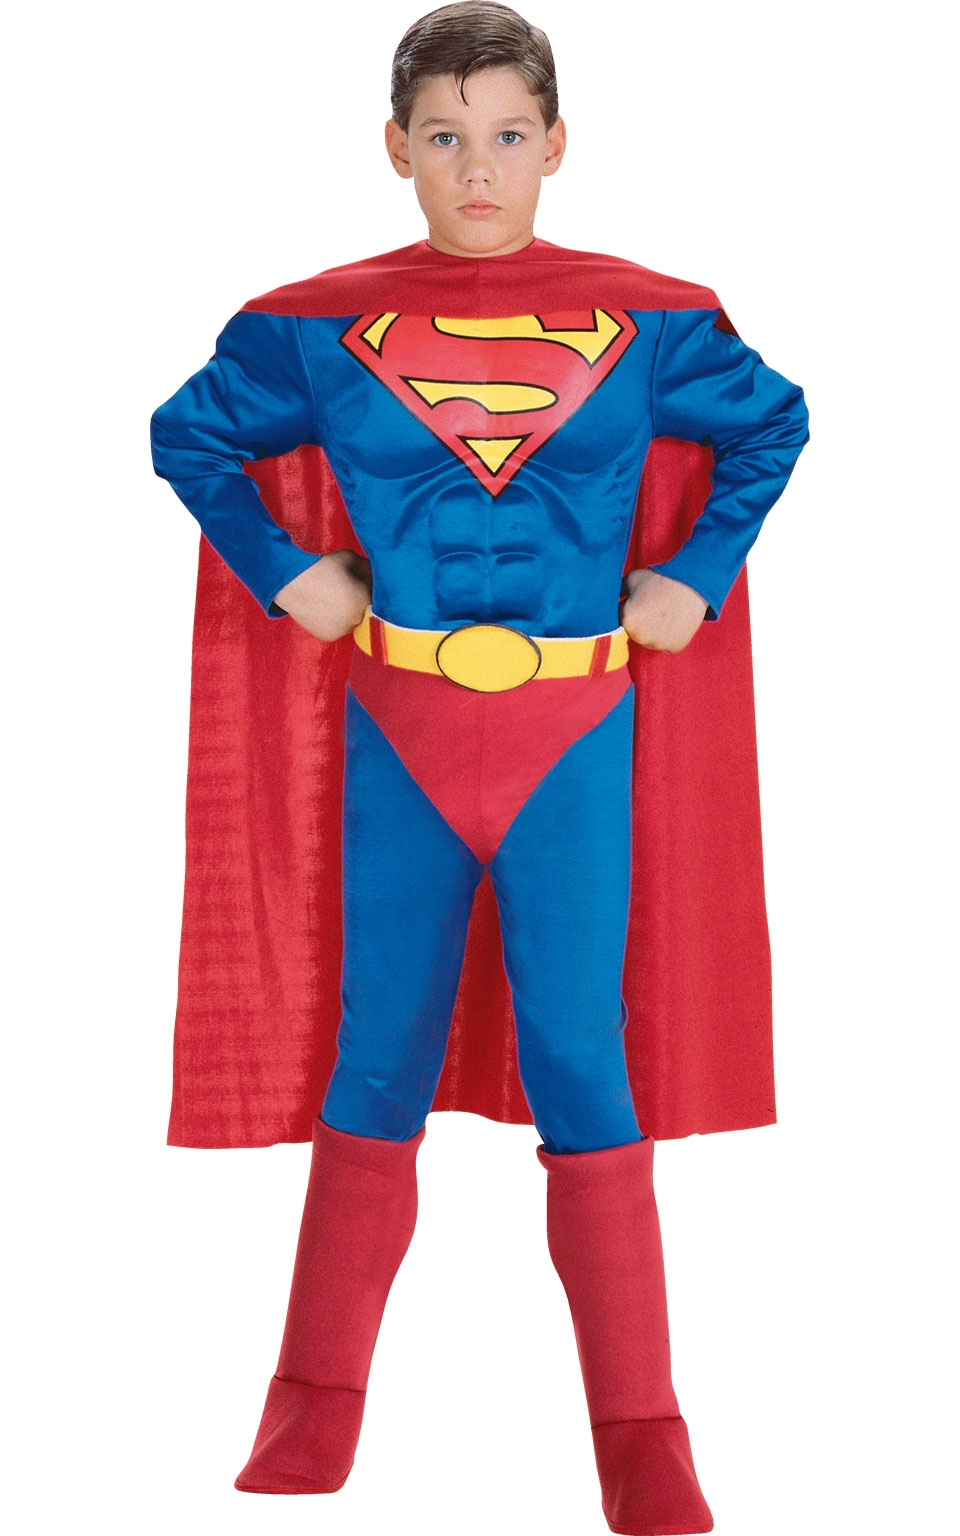 Костюм Супермена с мышцами детский (38-40) детский костюм клоуна весельчака 38